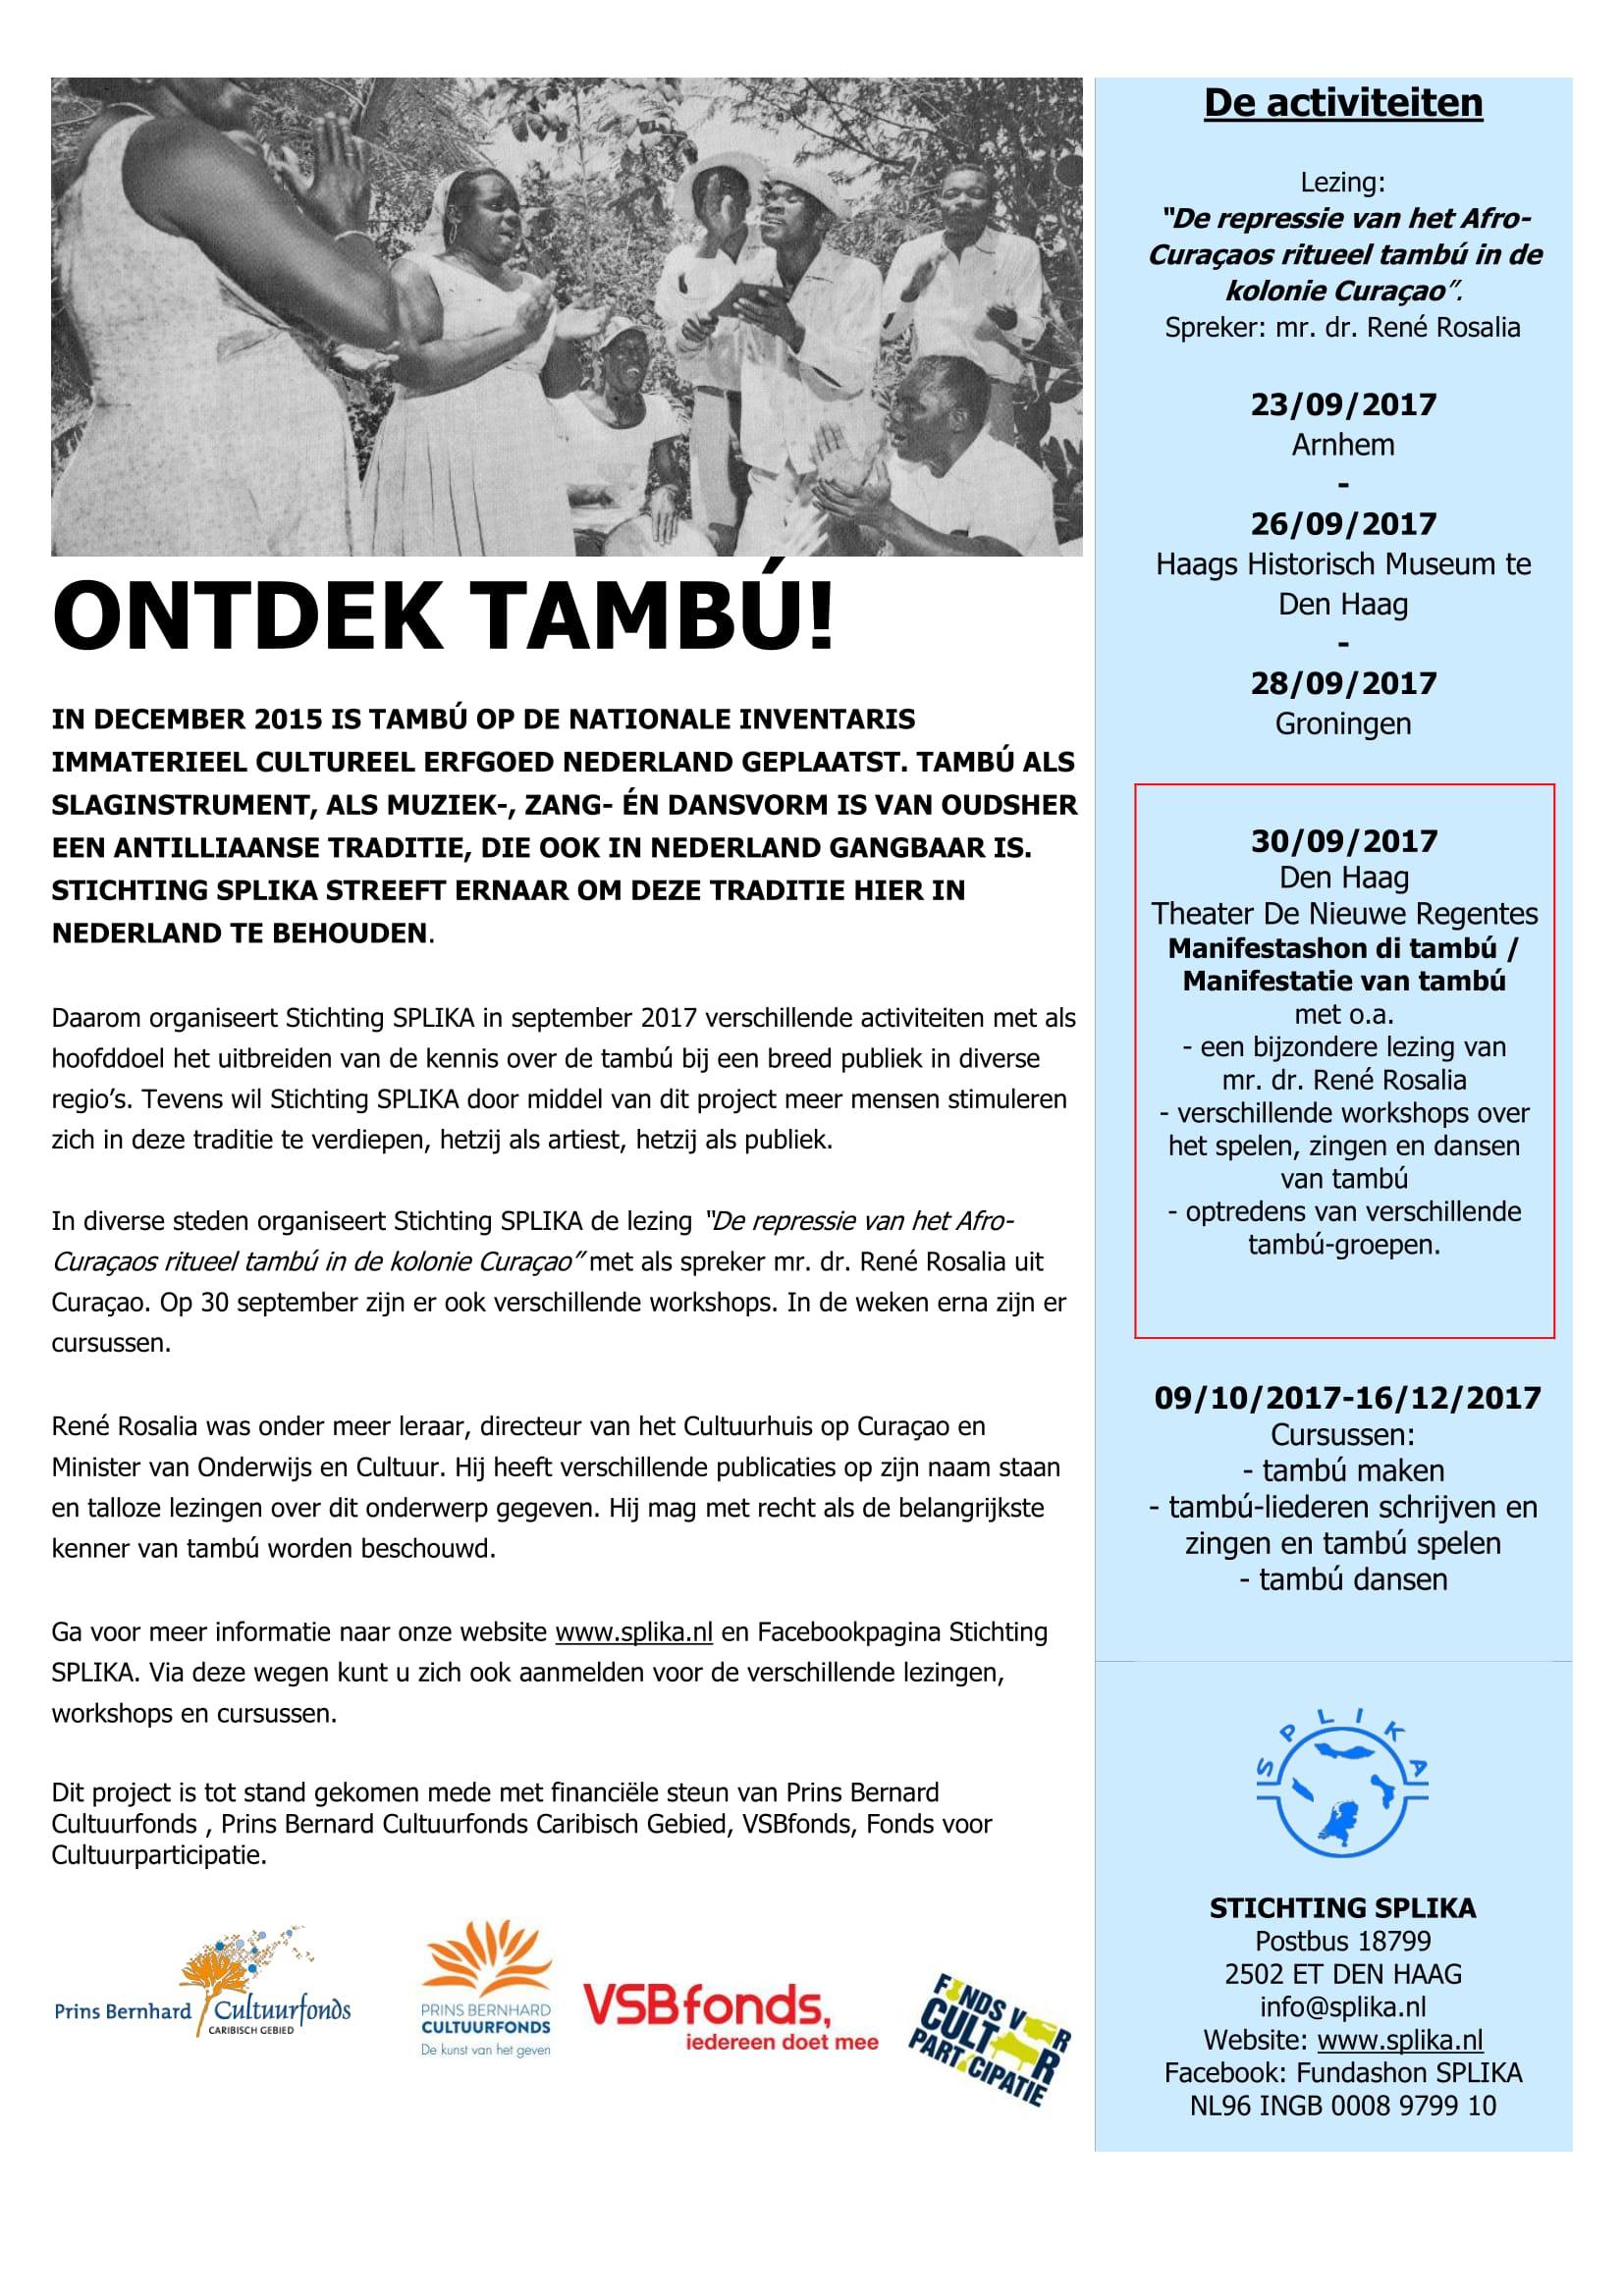 170824 poster Ontdek Poster Tambú